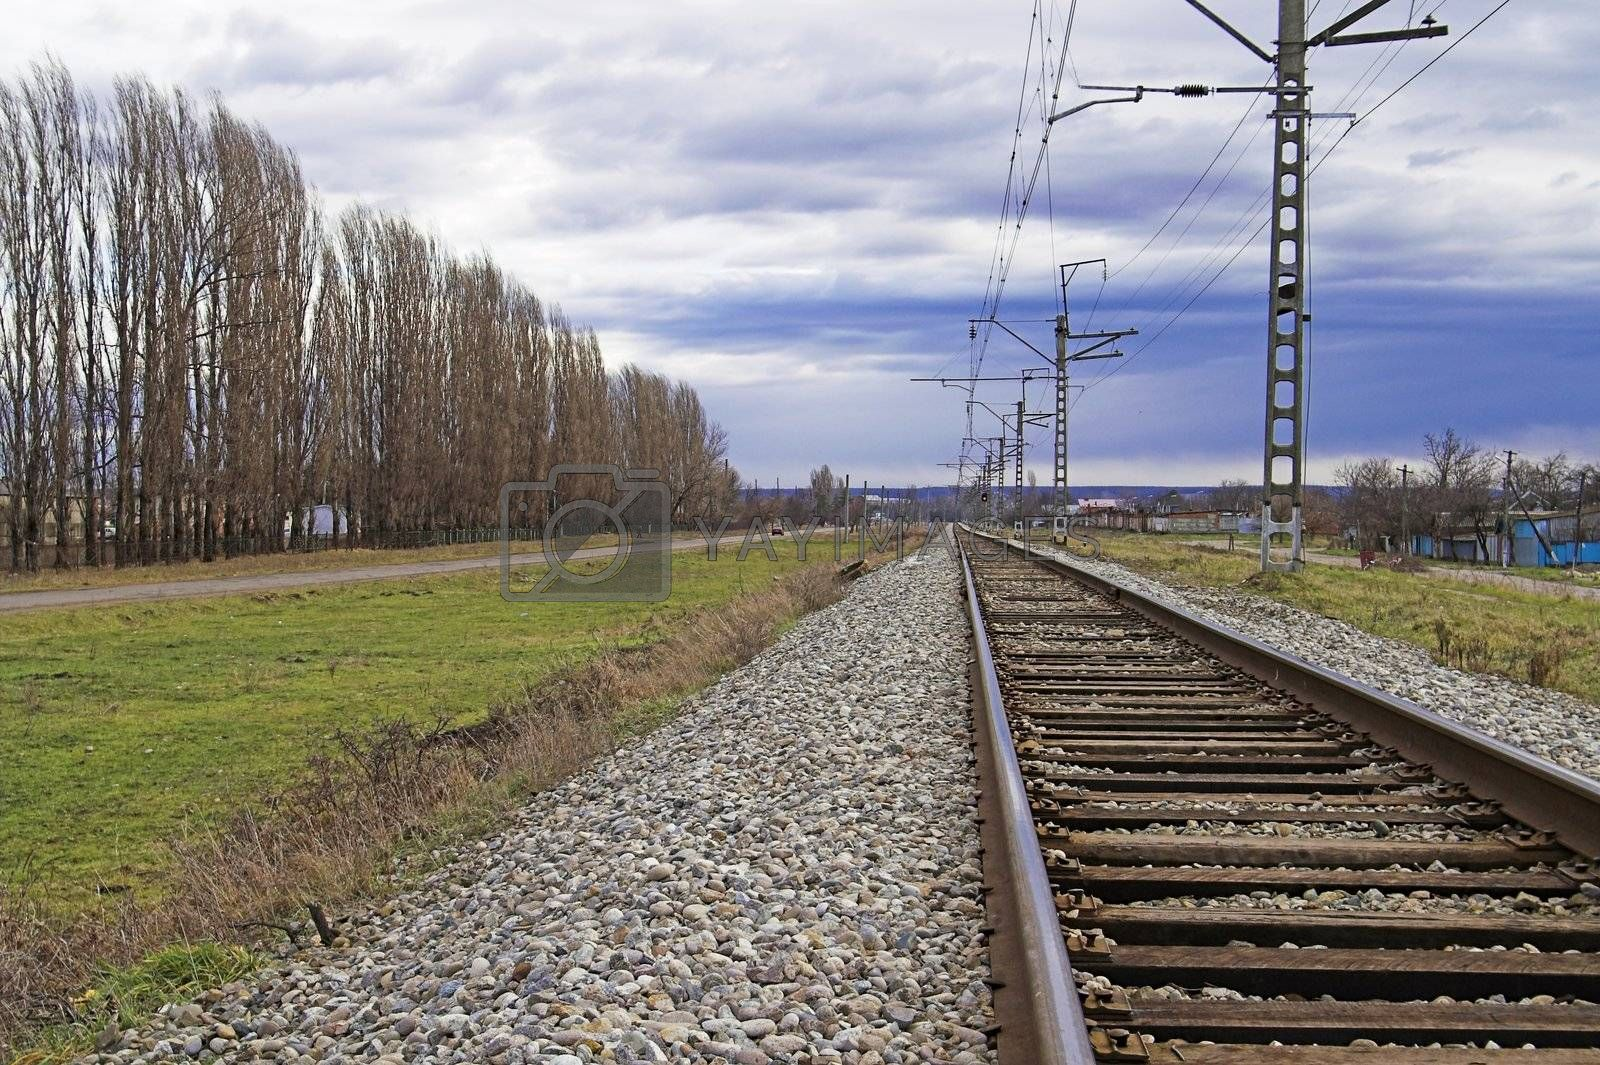 Railroad Embankment at Remote Area